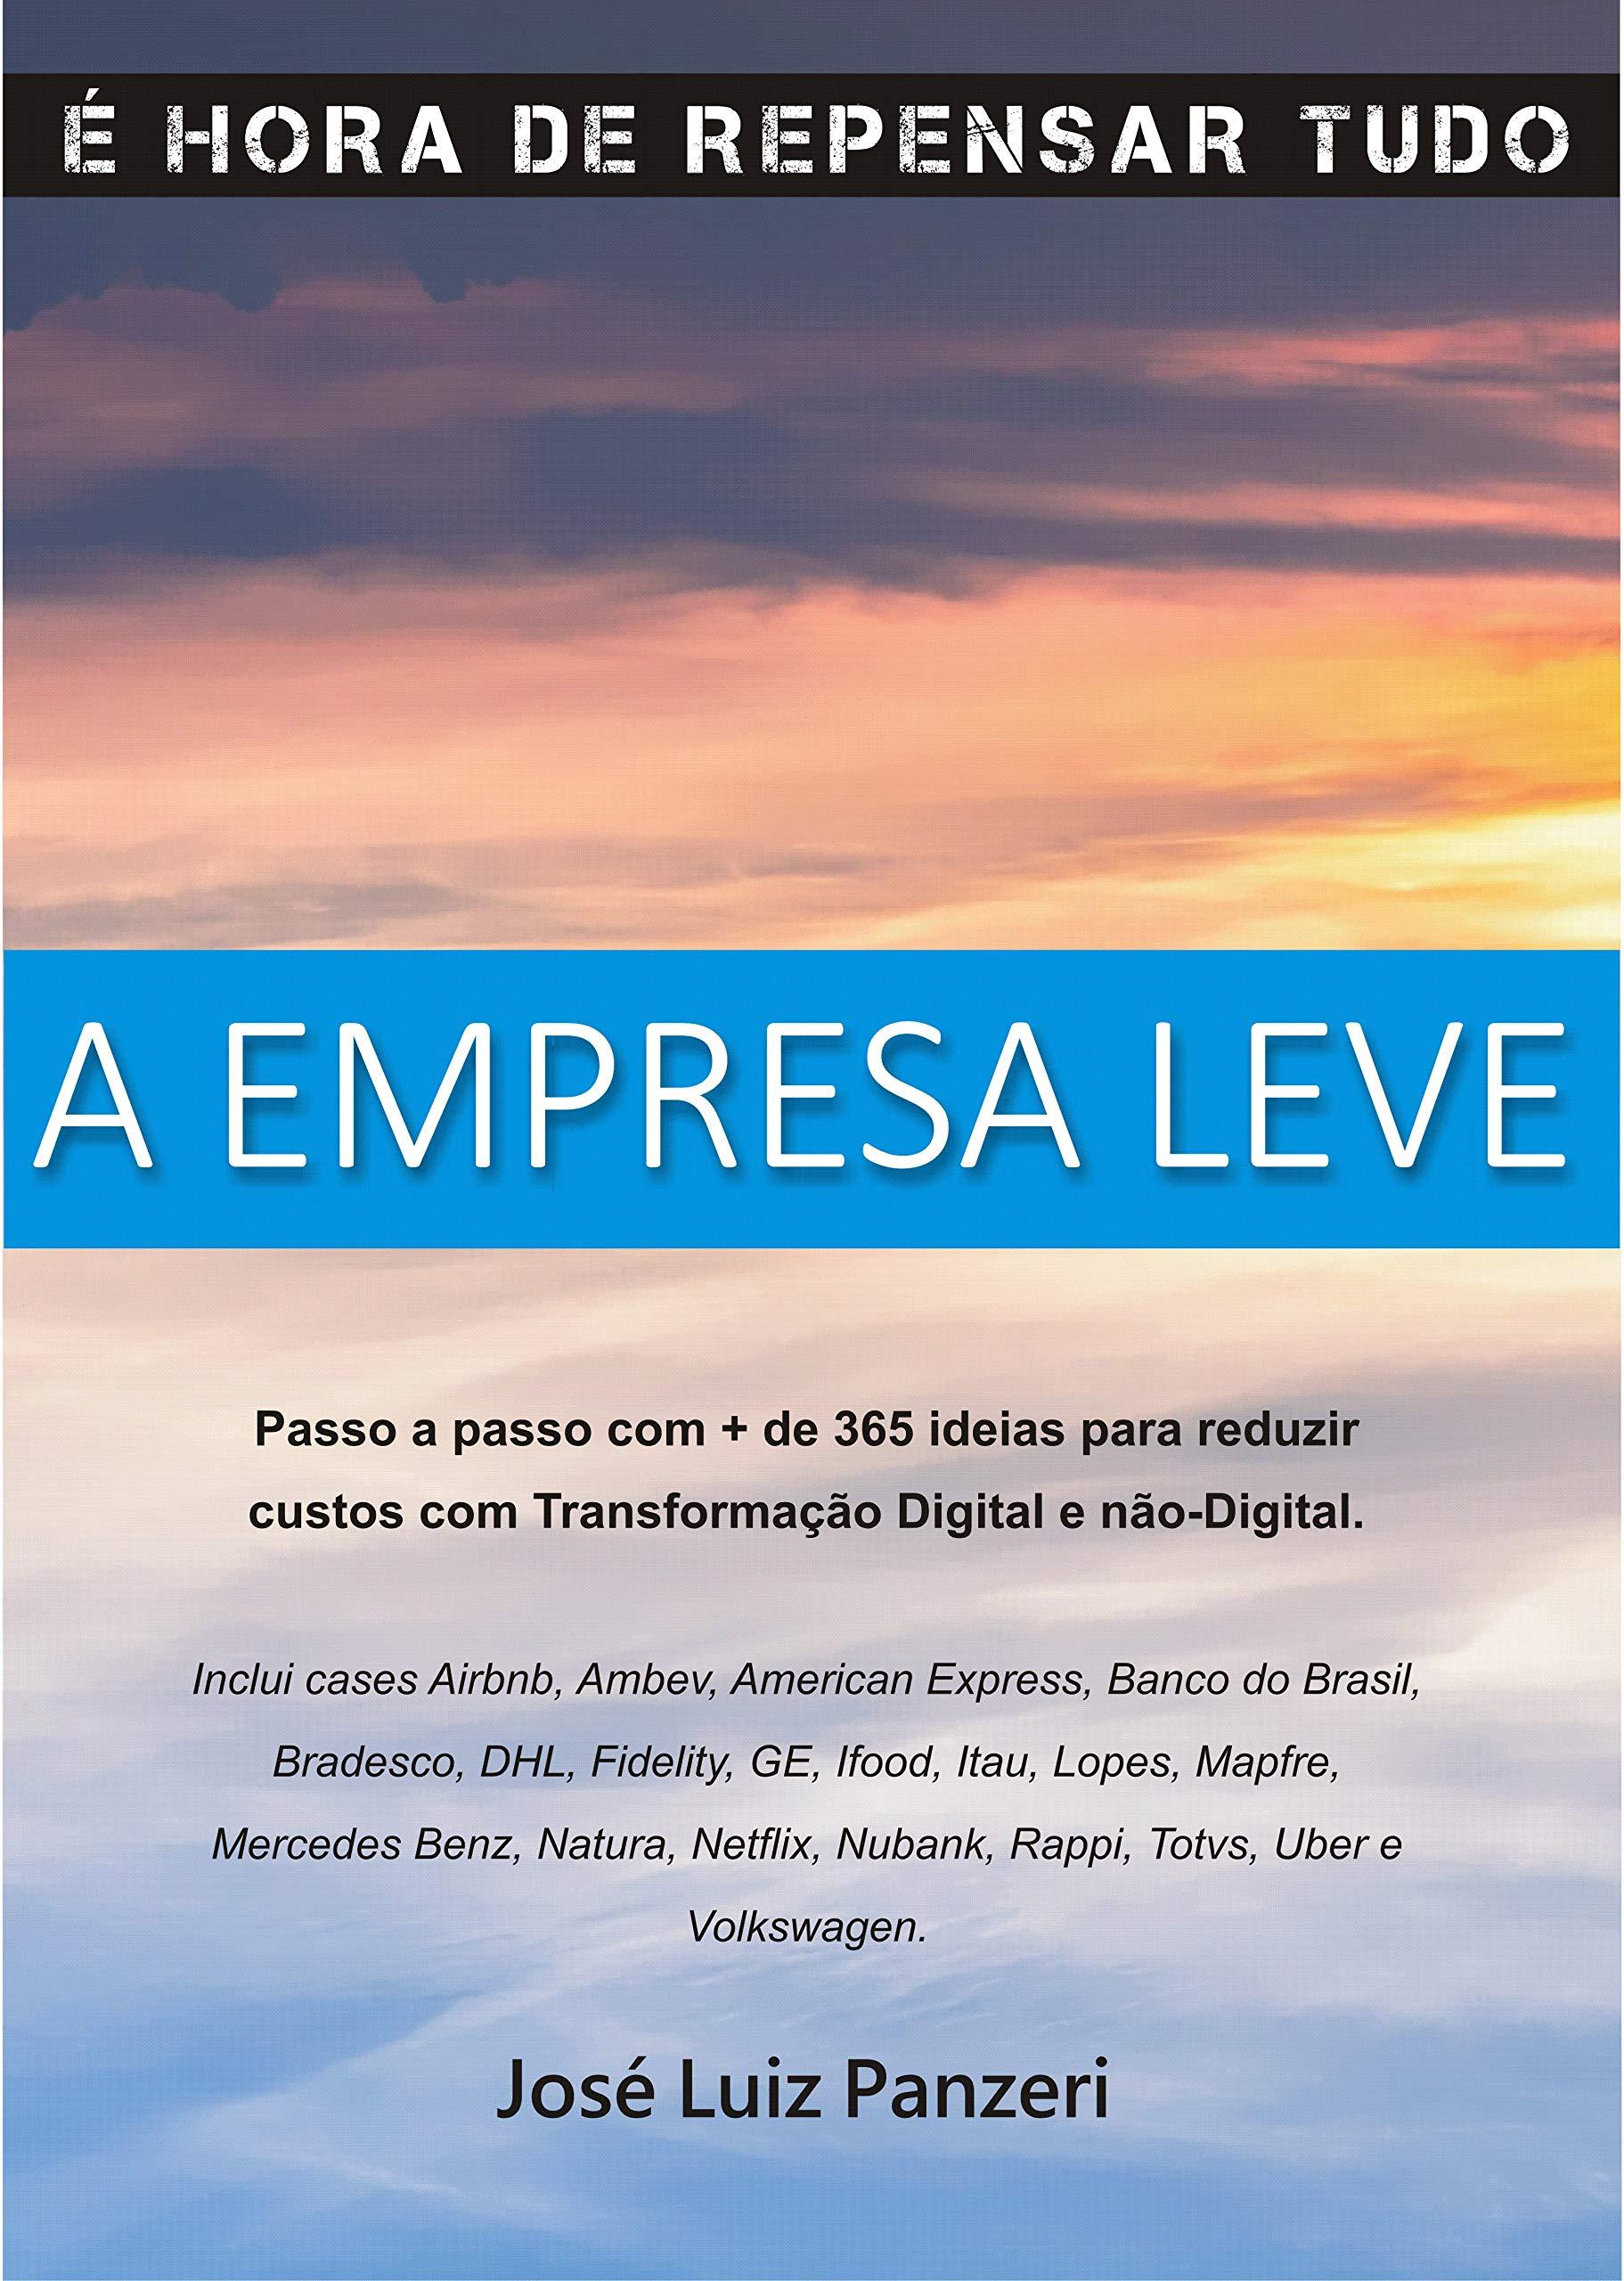 A Empresa Leve: É hora de repensar tudo! (Portuguese Edition)